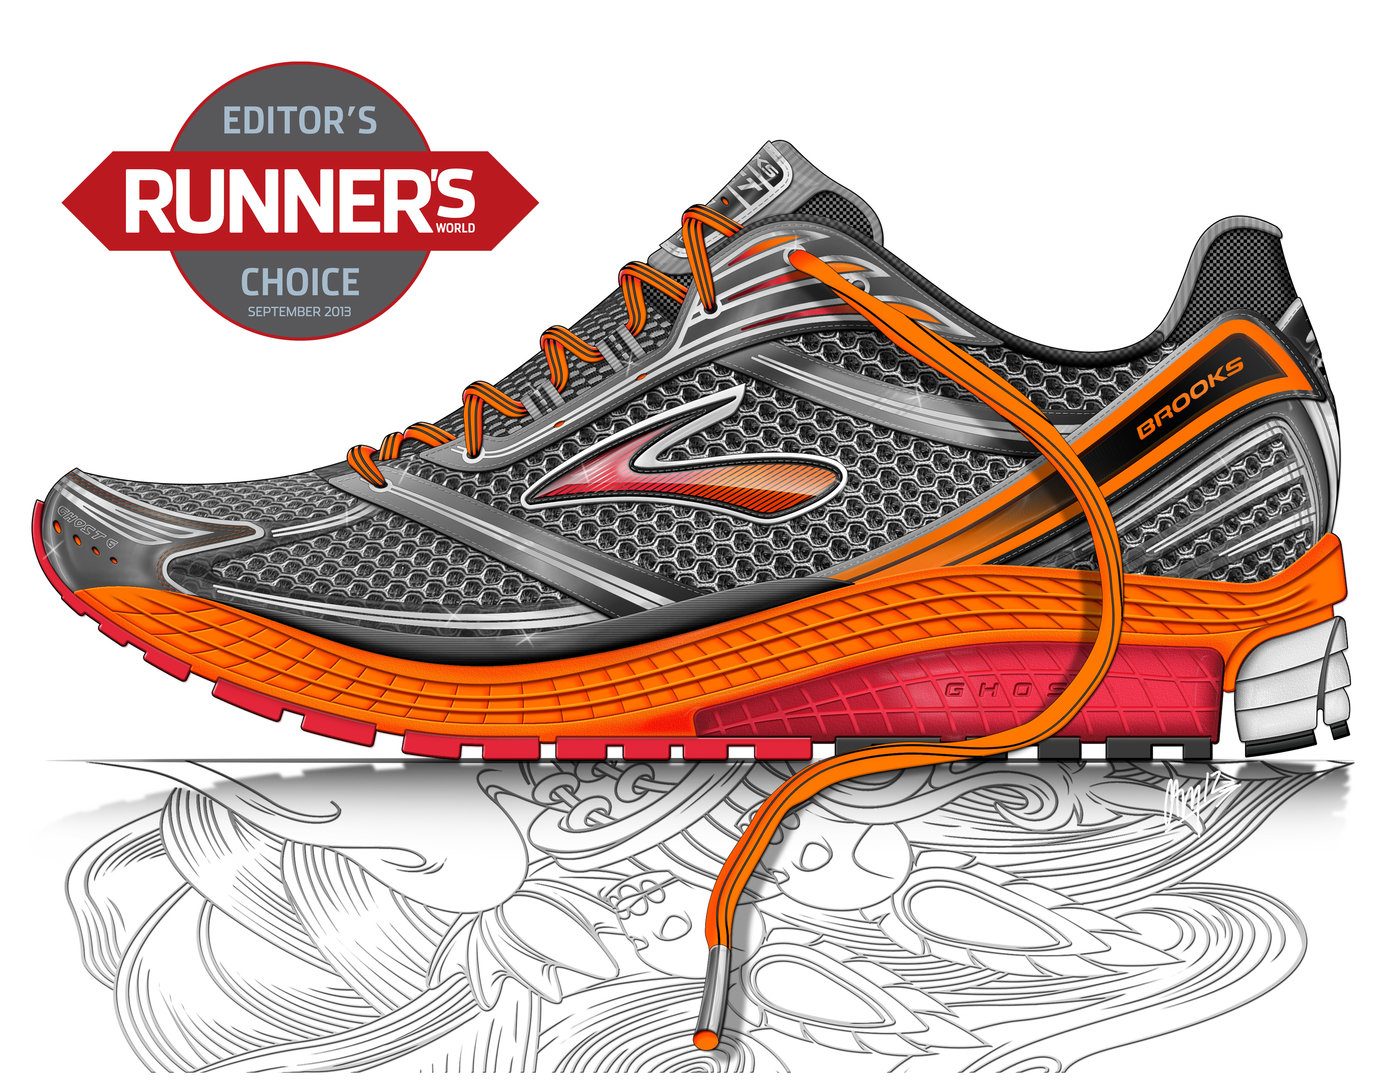 467541c283c Brooks Running Shoe Co by Cameron Braithwaite at Coroflot.com